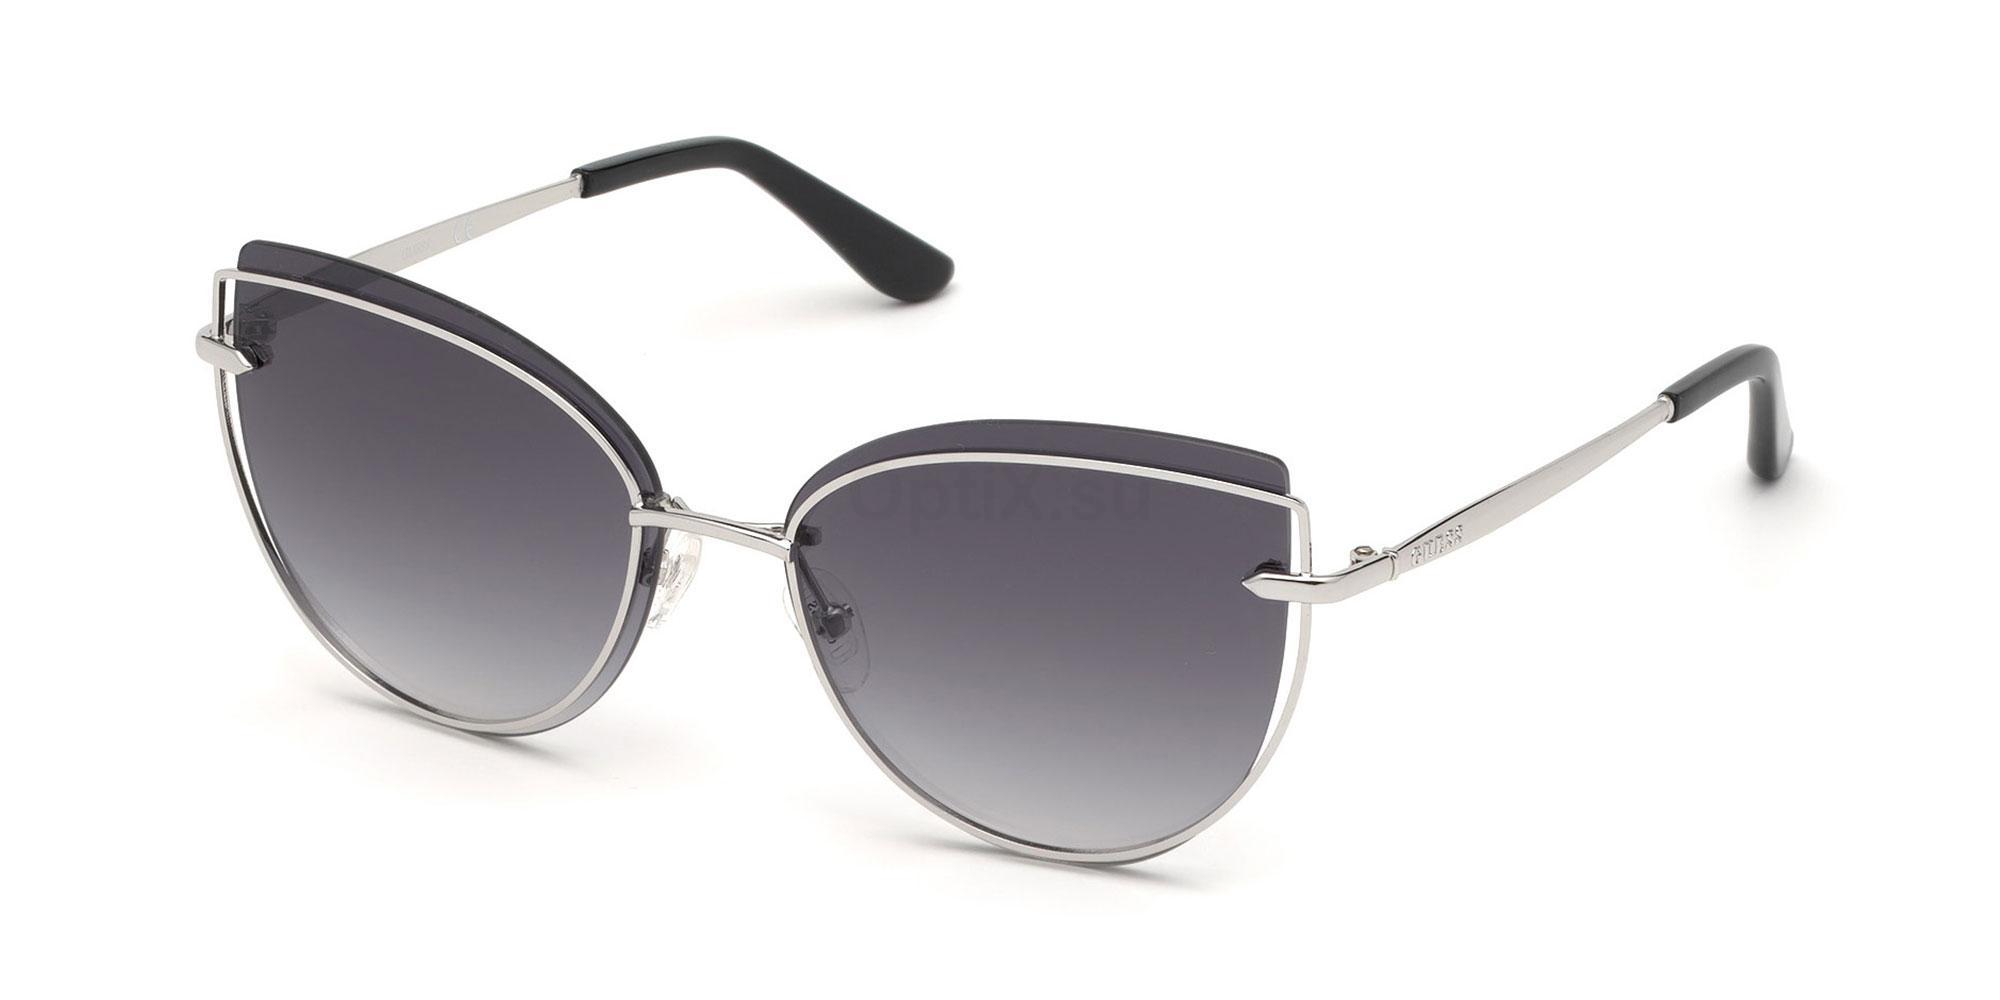 10B GU7617 Sunglasses, Guess